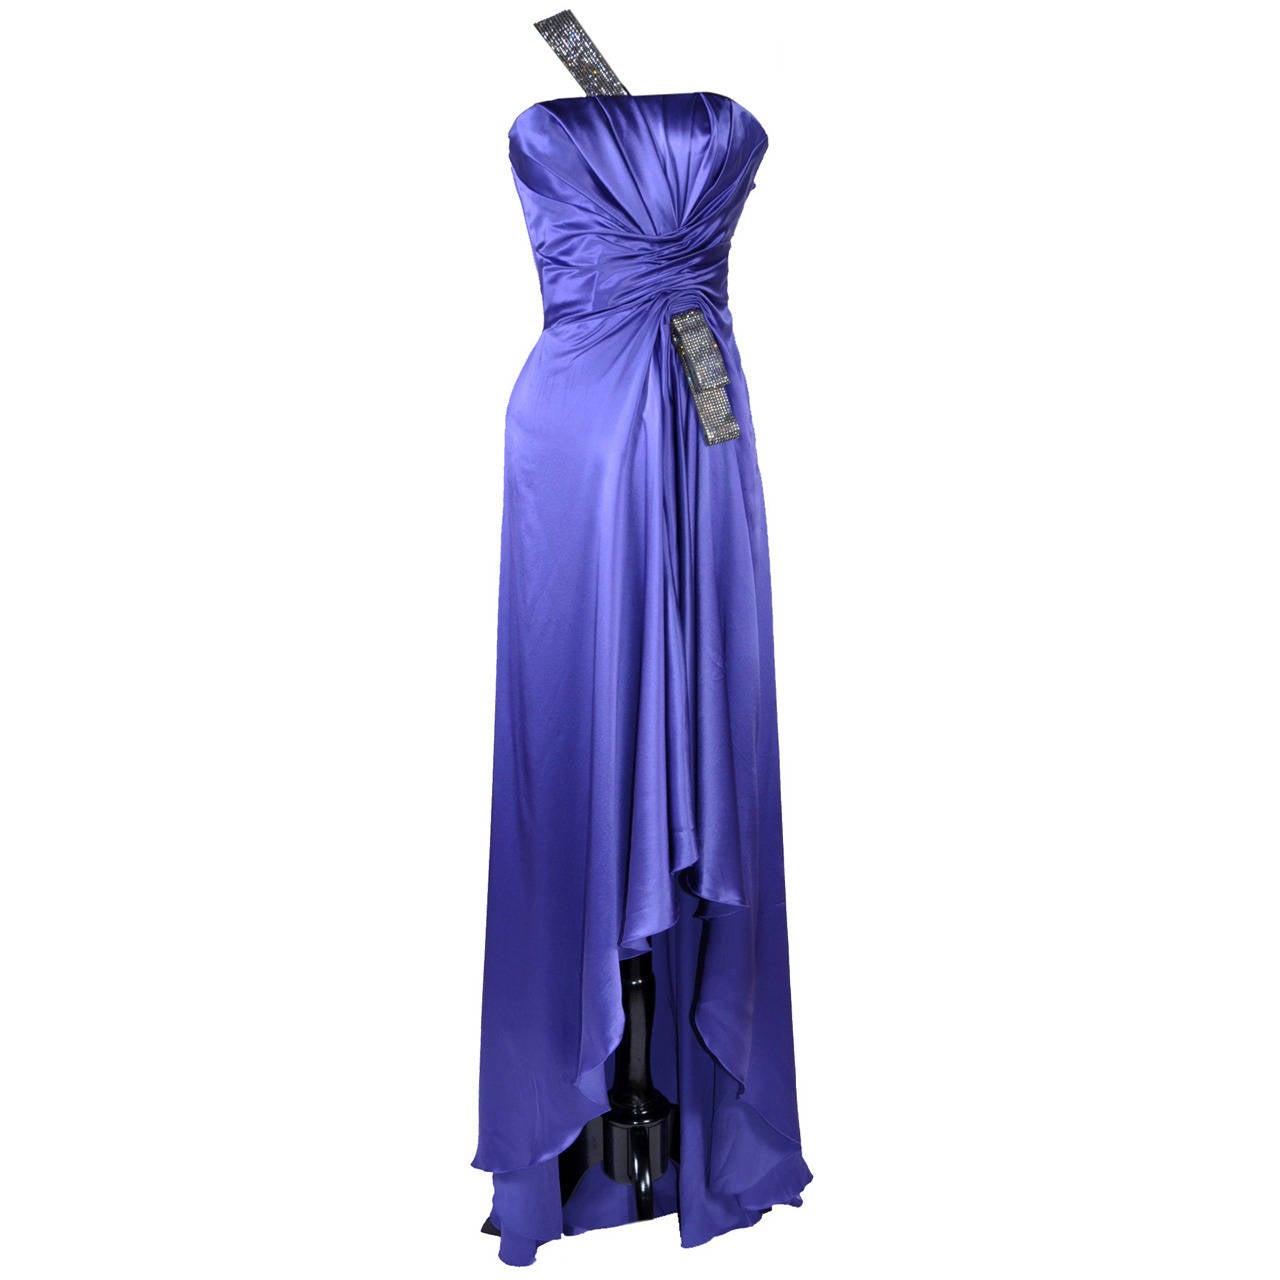 New VERSACE PURPLE CRYSTAL EMBELLISHED LONG DRESS